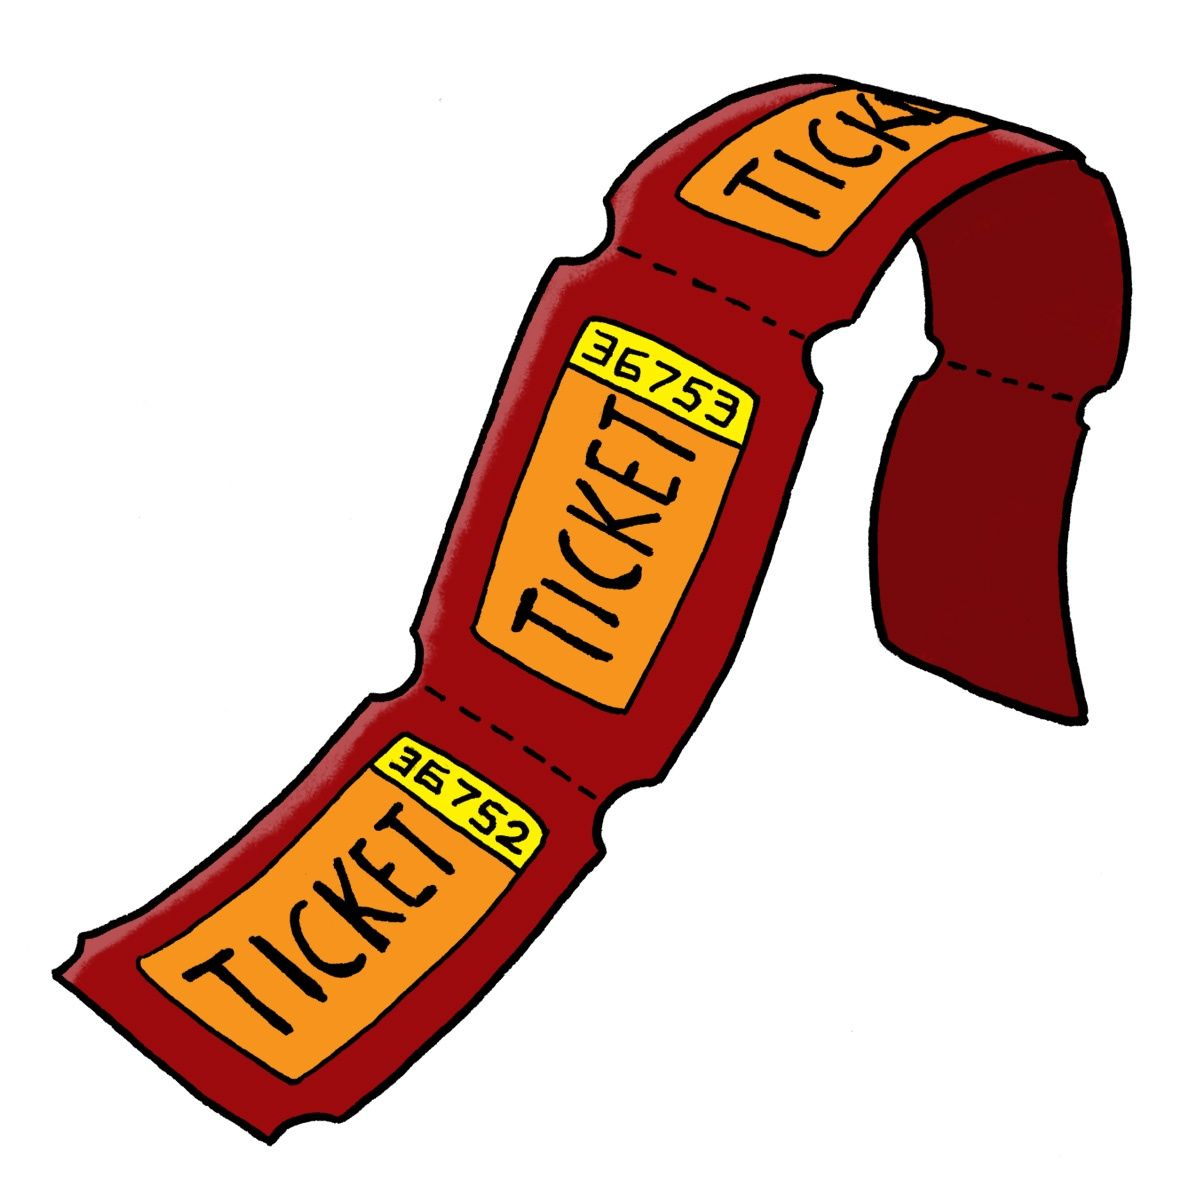 Carnival Ticket Clipart Carnival Tickets Clip Art Raffle